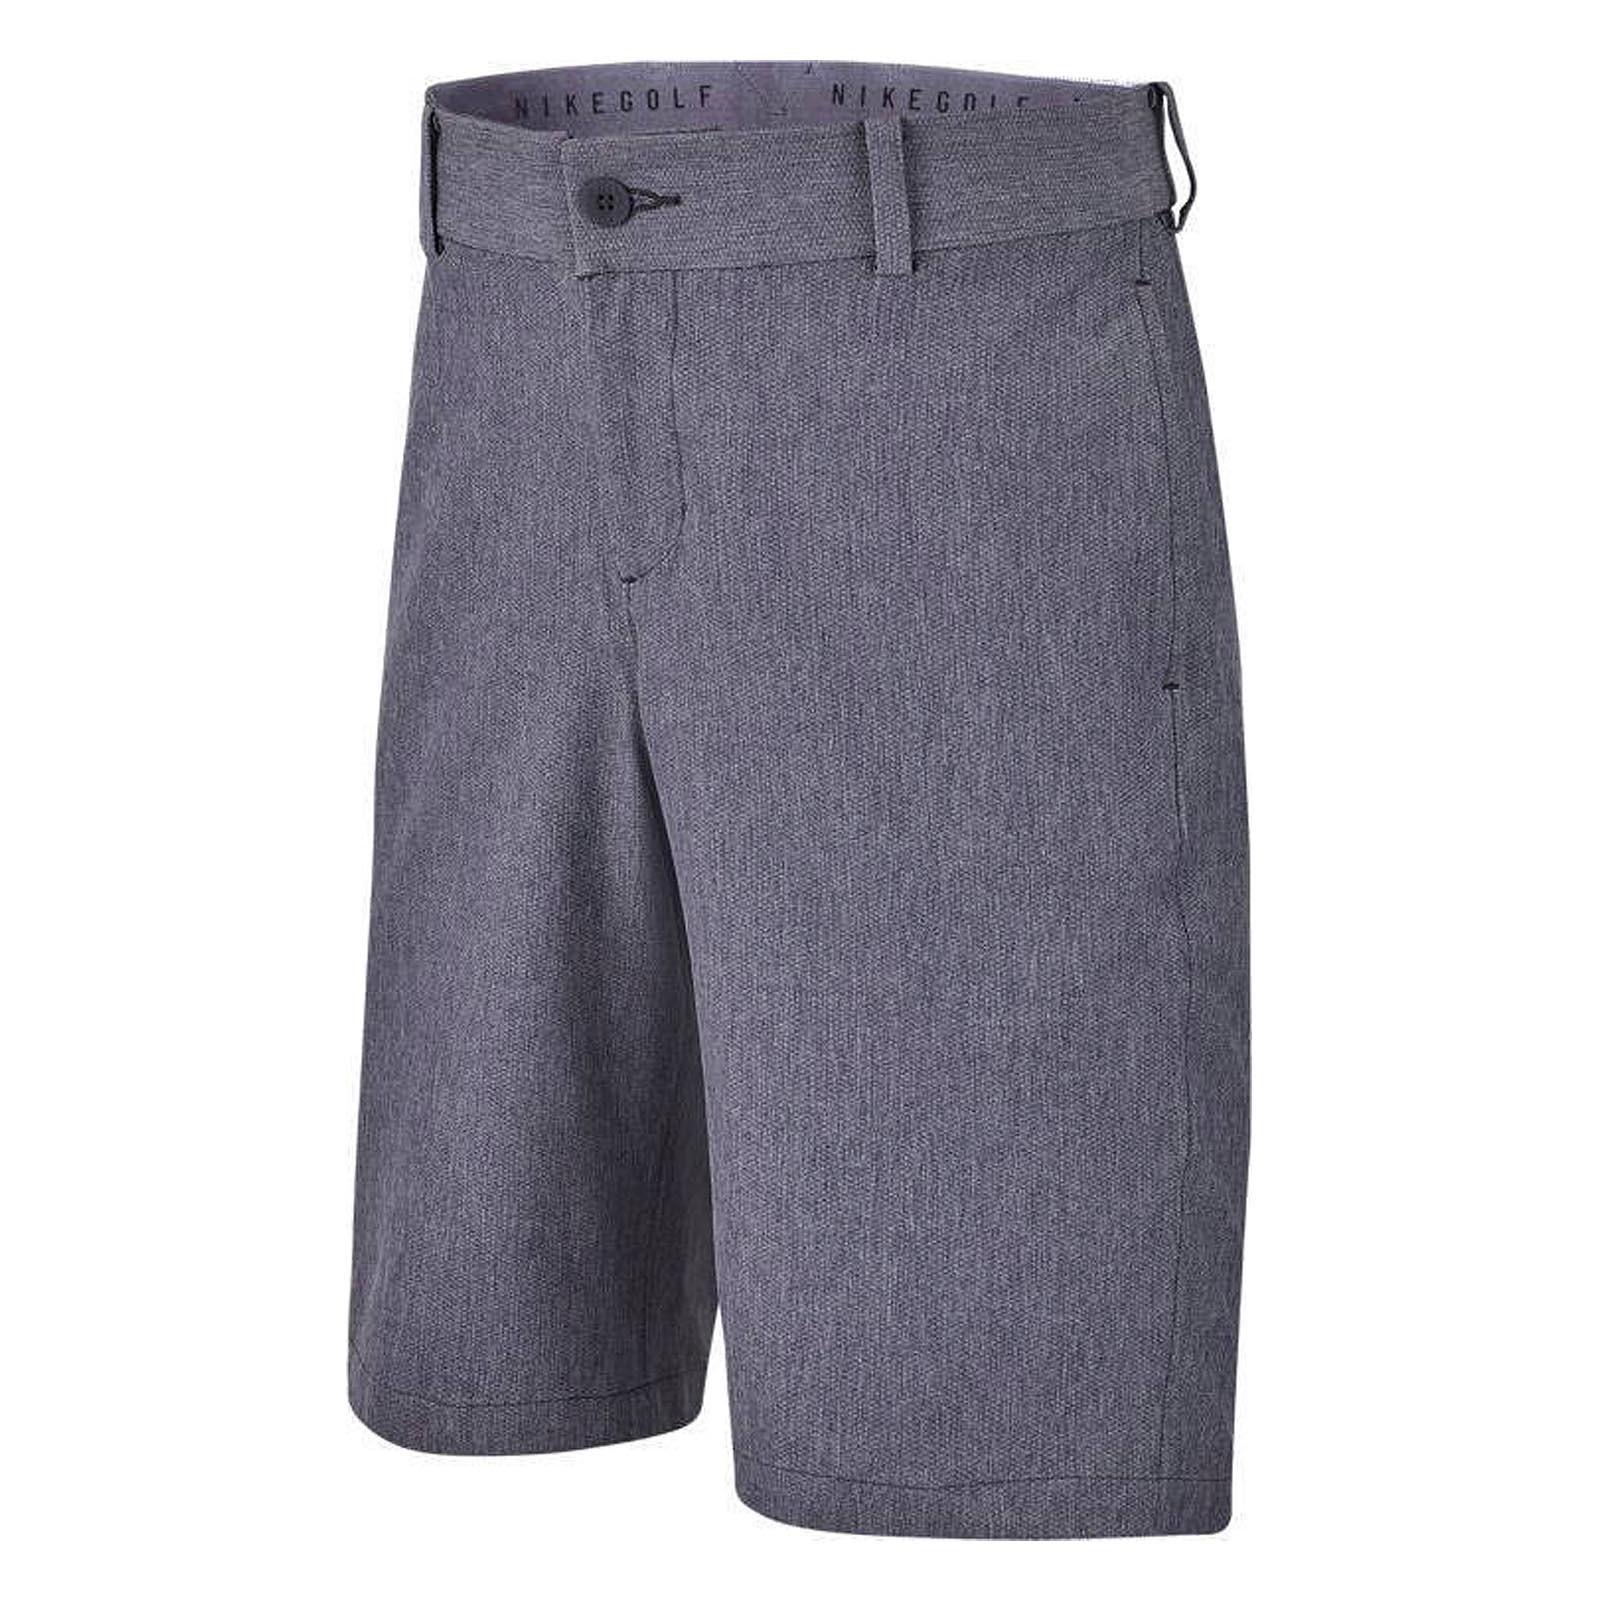 Compañero paciente traicionar  Nike Flex Junior Golf Shorts